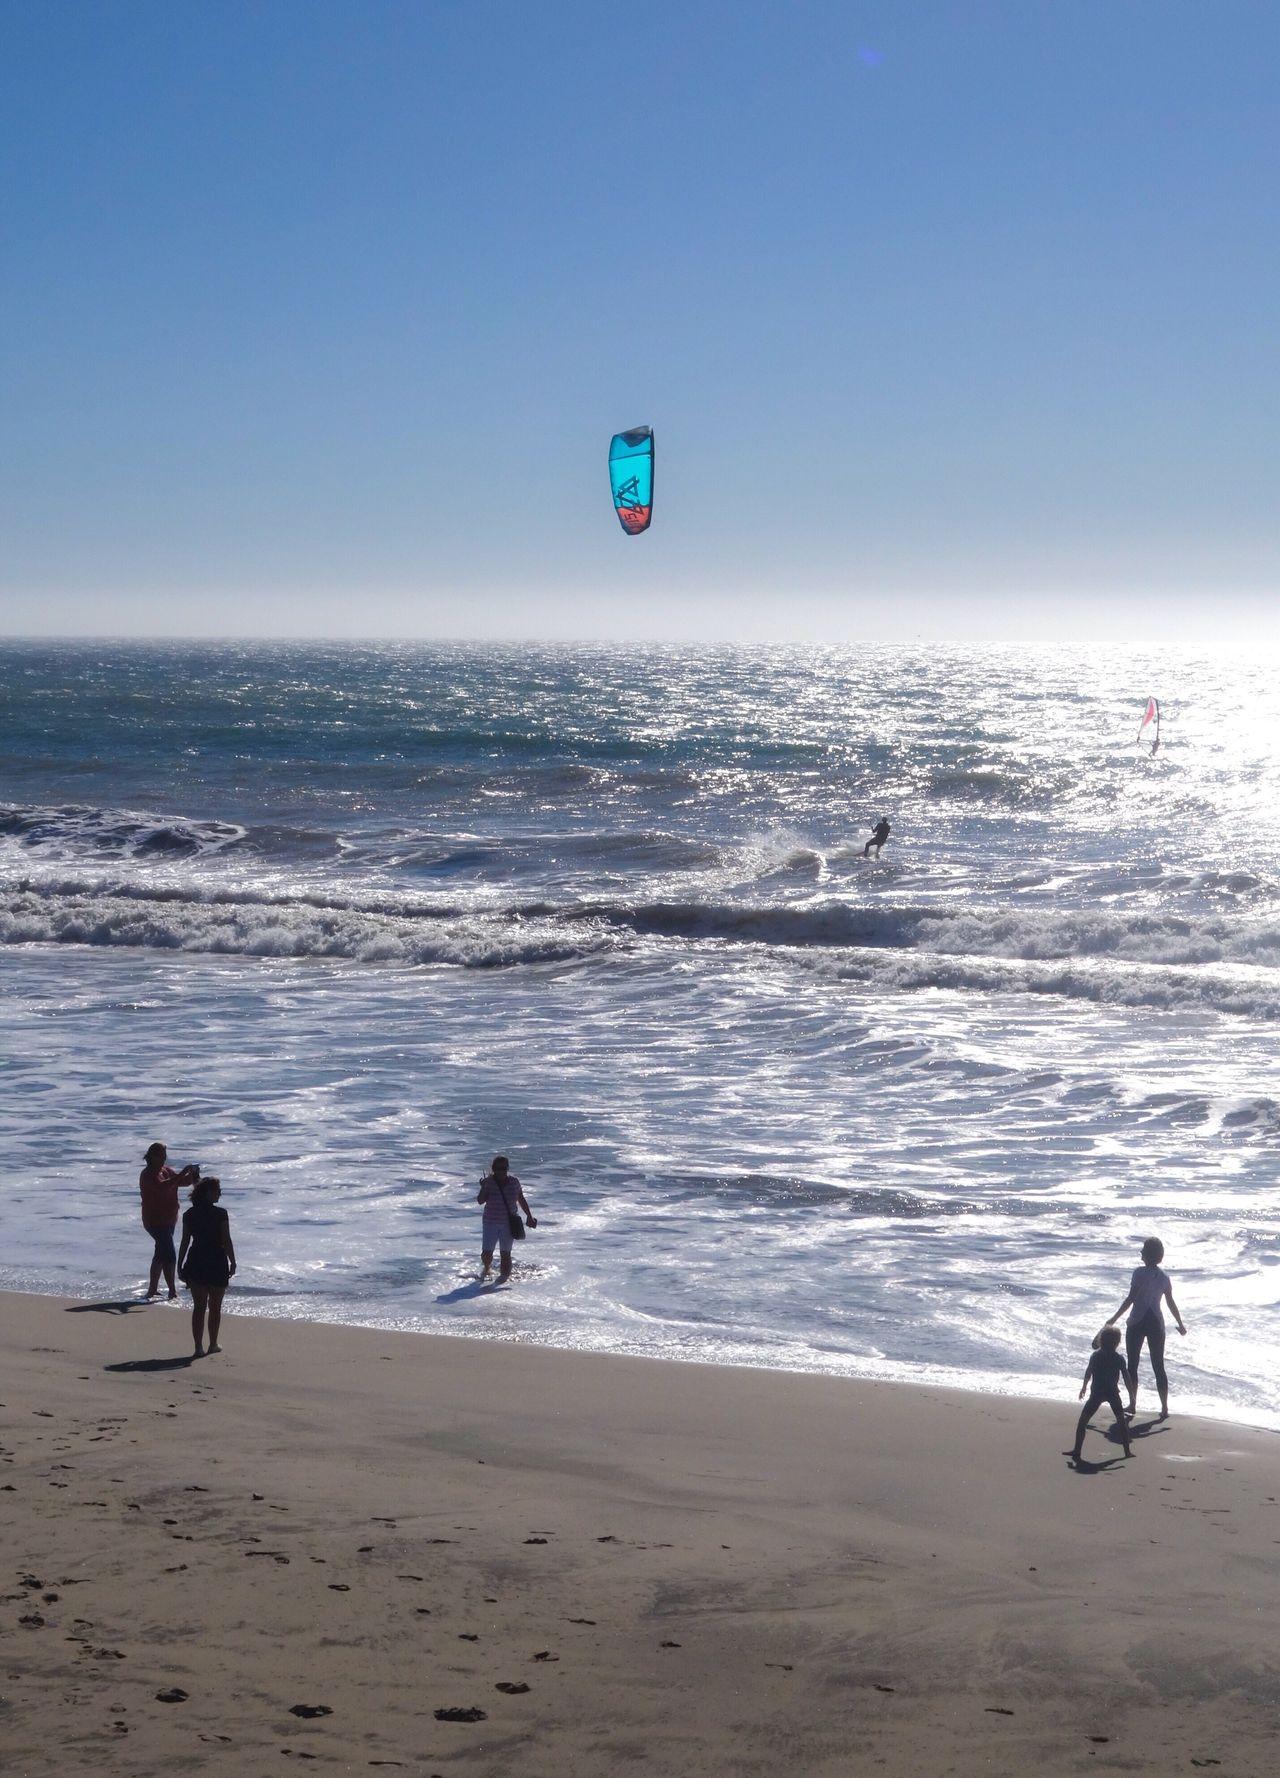 Beach Sea Sand Water Leisure Activity Shore Real People Scenics Lifestyles Sport Wave Adventure Pacific Travel EyeEmNewHere Kitesurfing Ocean California Santa Cruz California Extreme Sports Waves